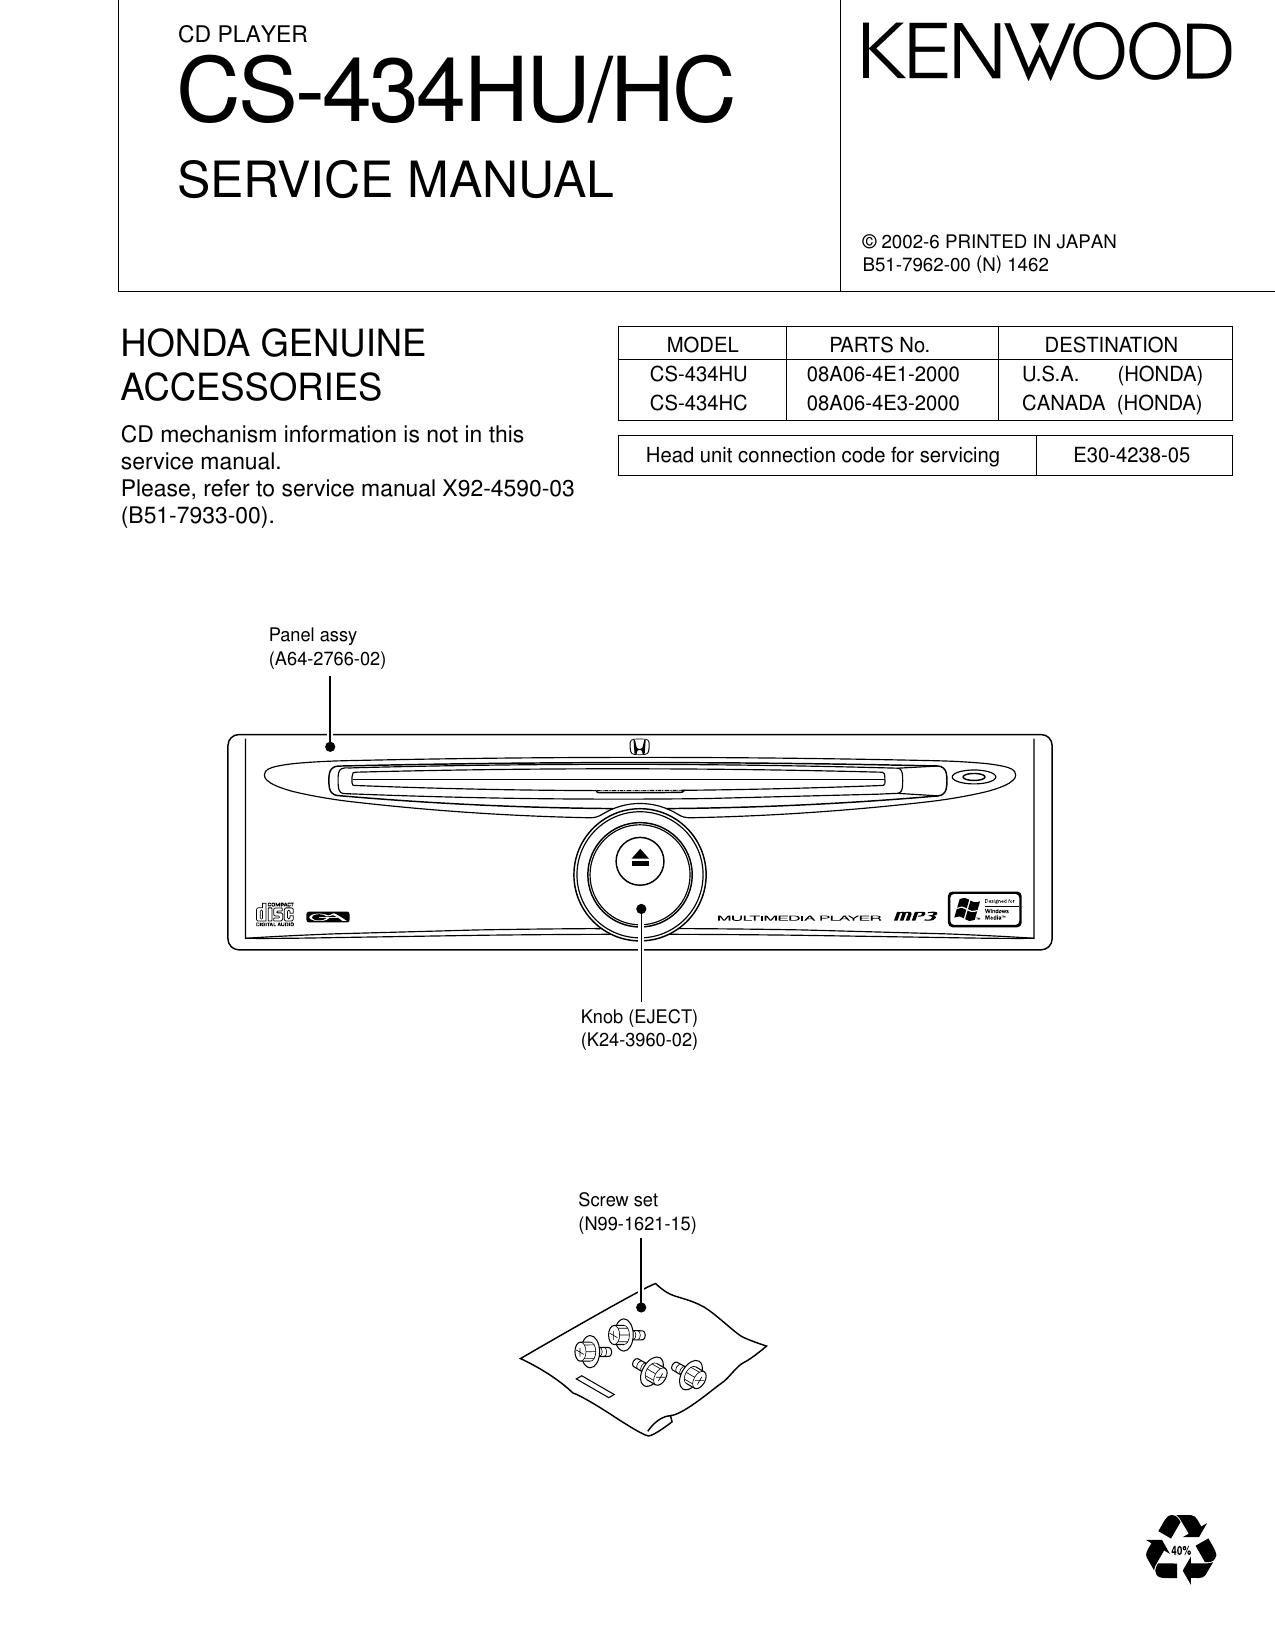 kenwood cs 434 hu service manual rh audioservicemanuals com Display Color Kenwood Head Unit How Many Pins in a Kenwood Head Unit